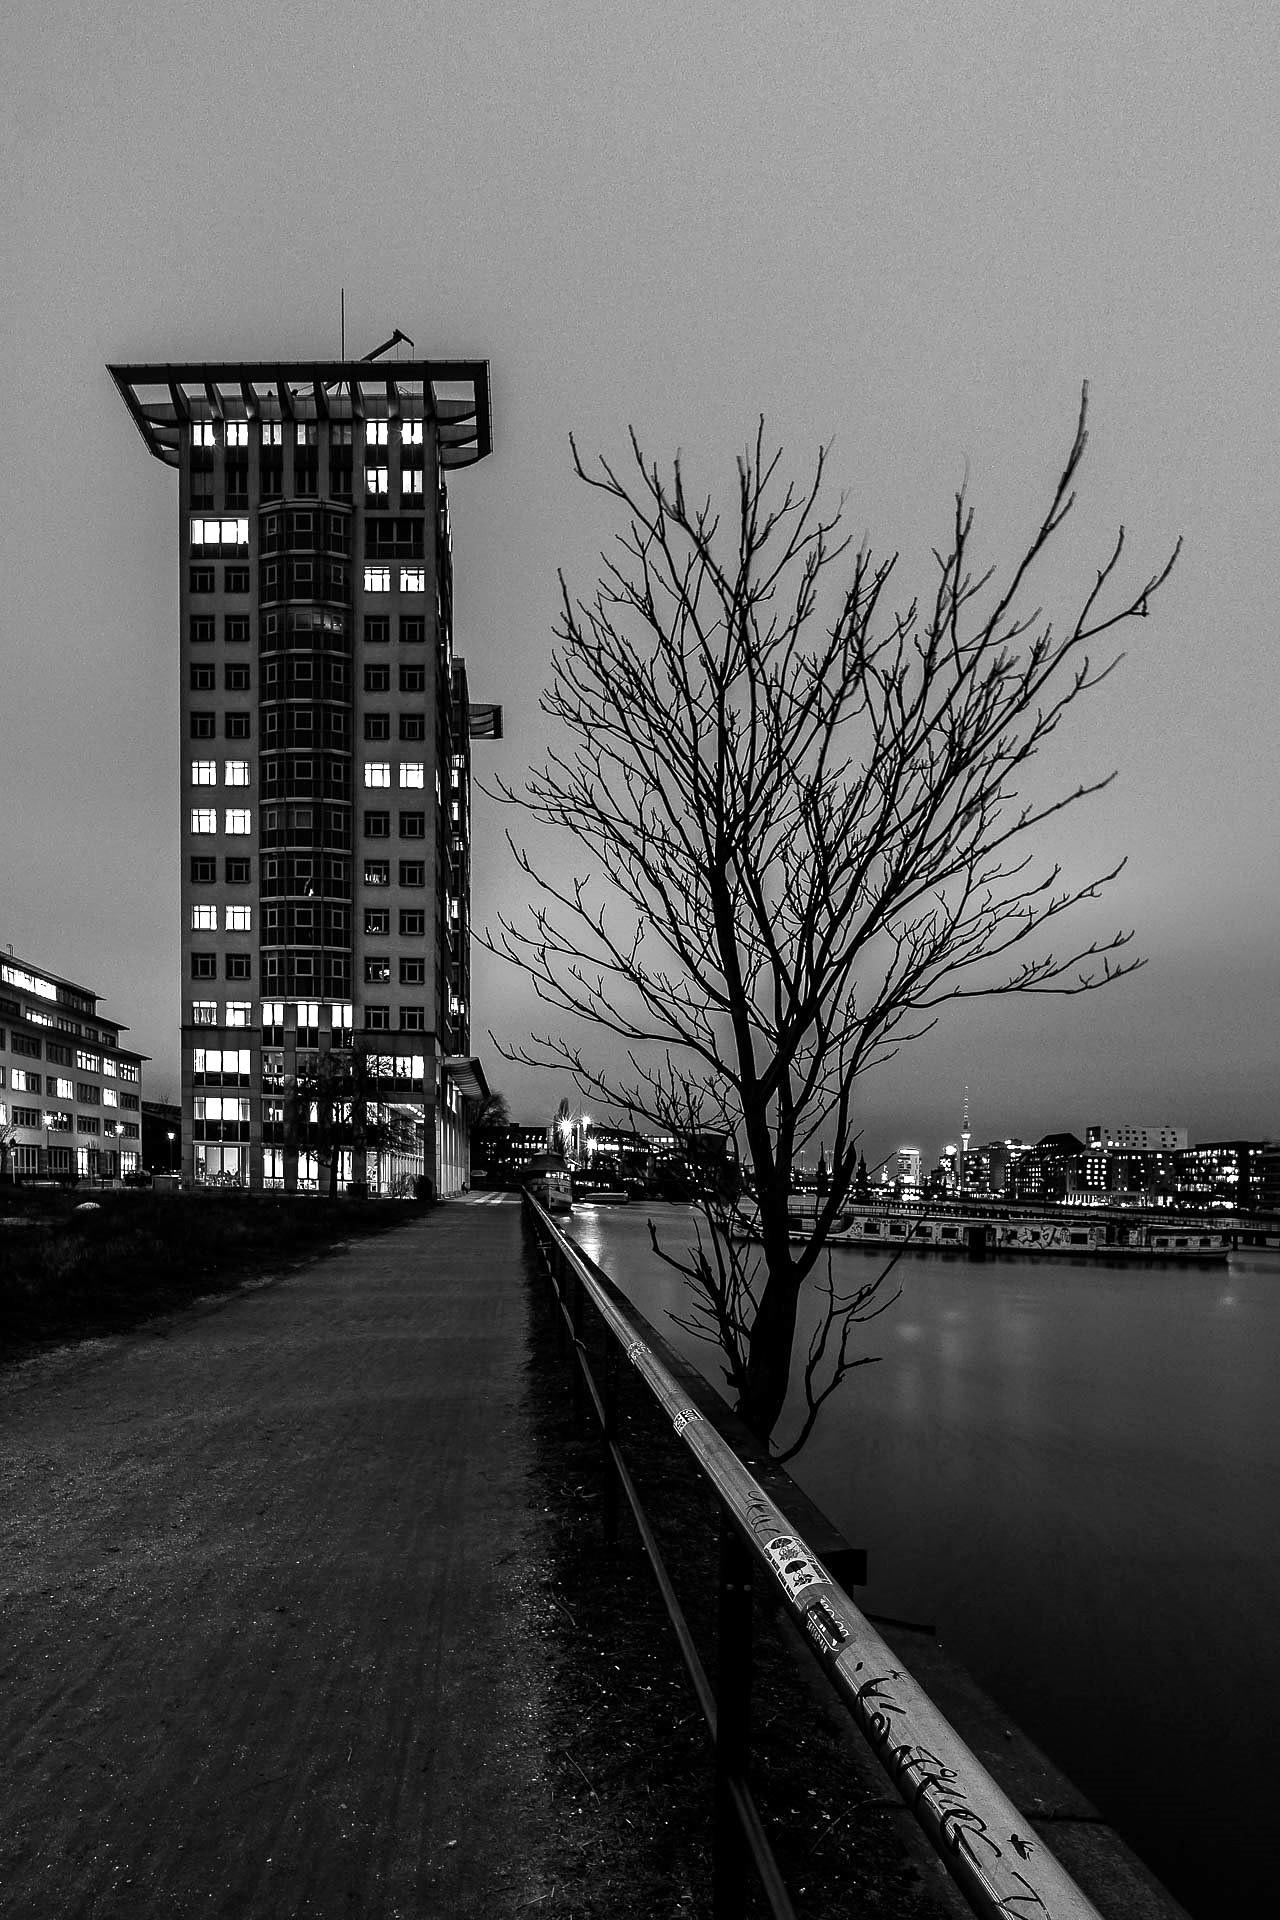 Darkside Berlin by JeckstadtPhotography